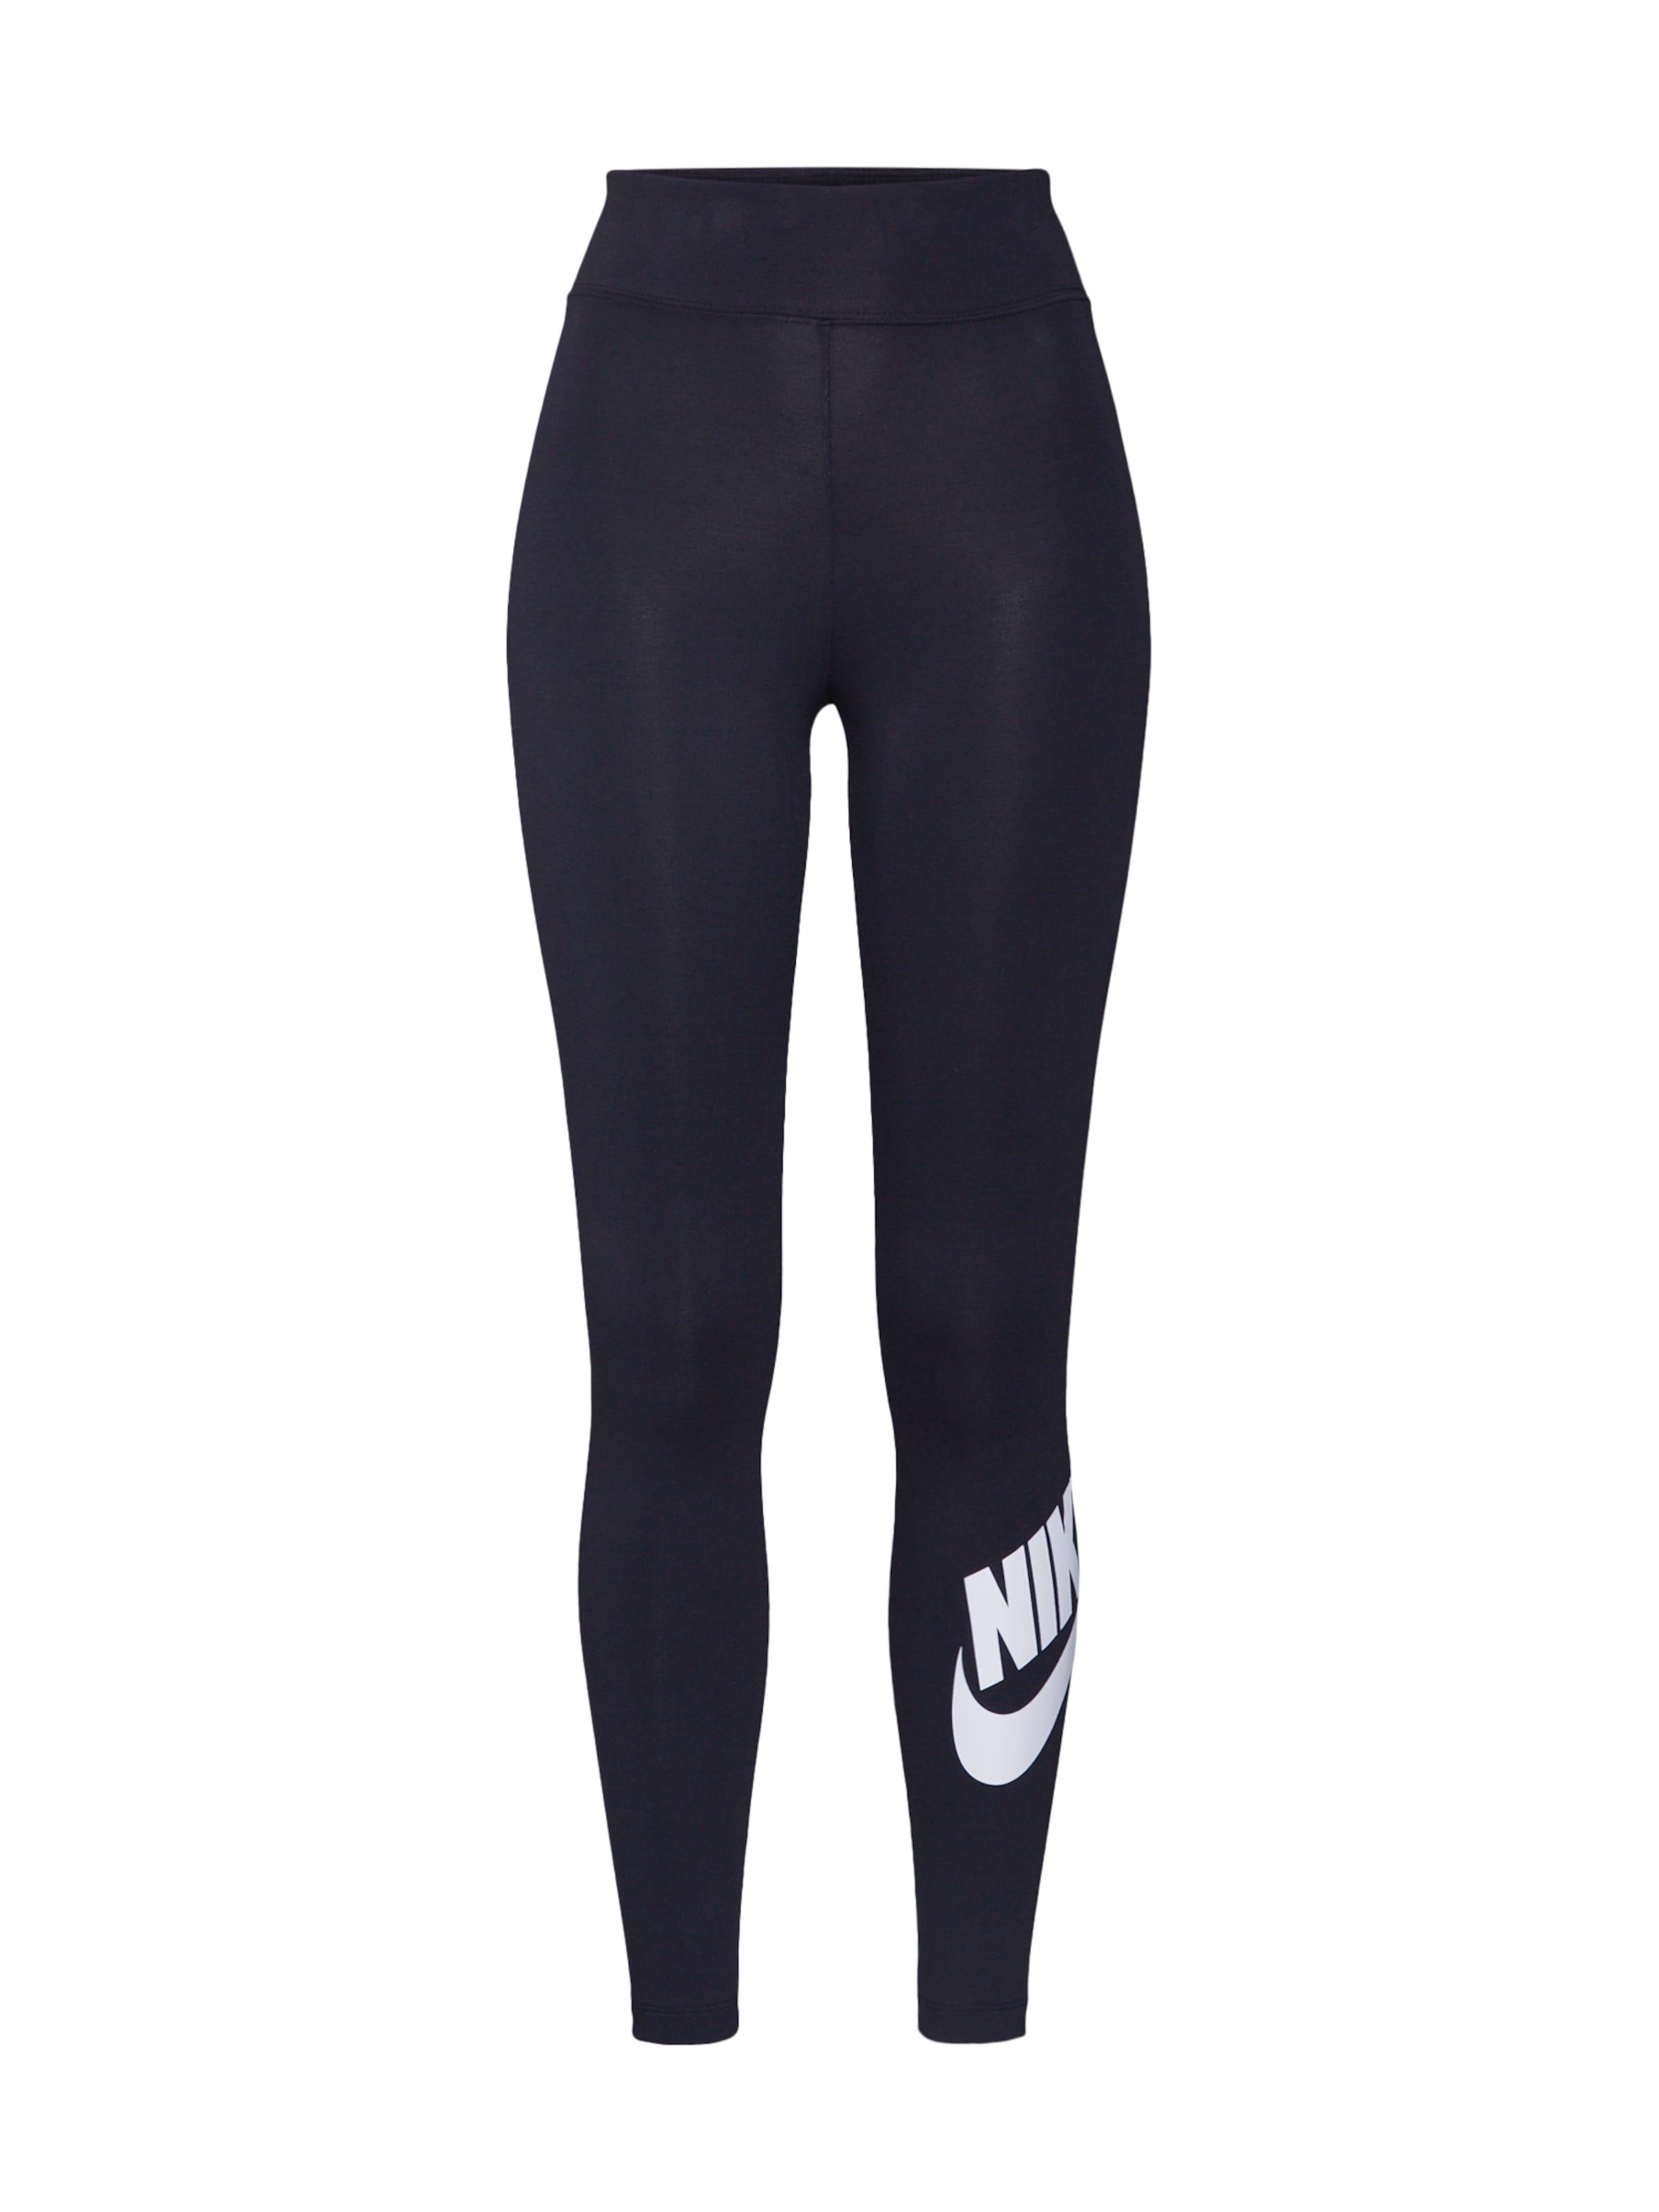 Nike Sportswear Leggings i svart